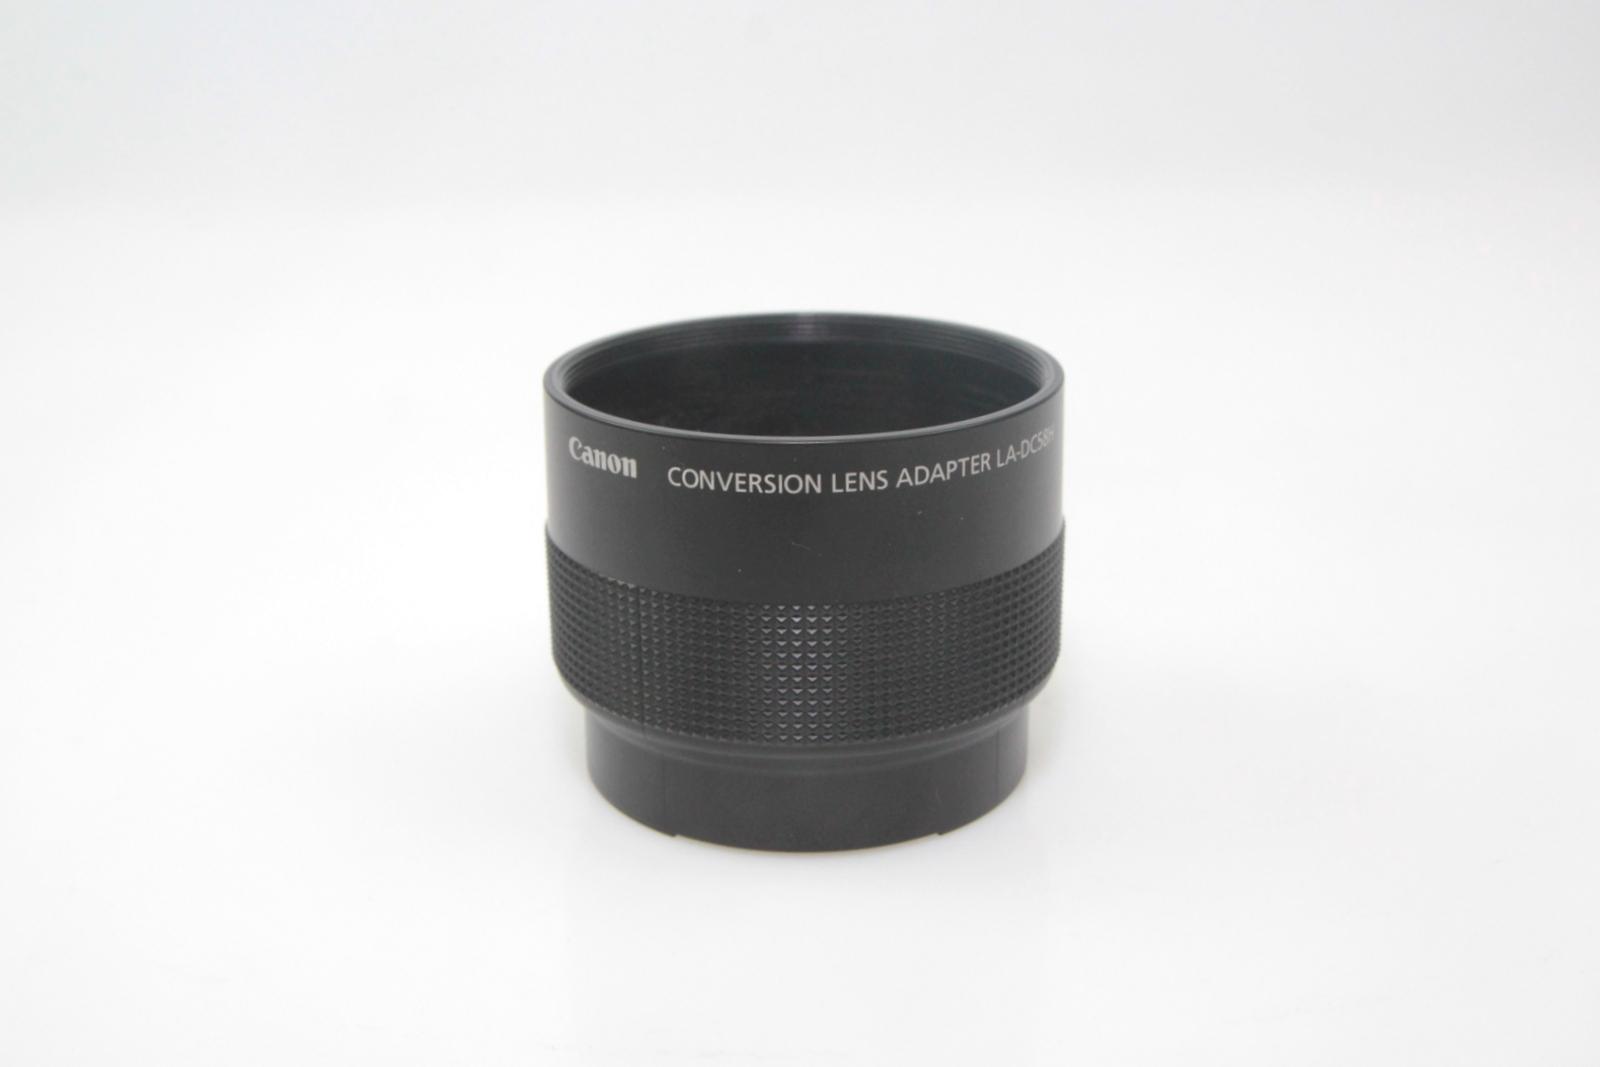 details about canon conversion lens adapter la dc58h for powershot g7 g9 digital cameras